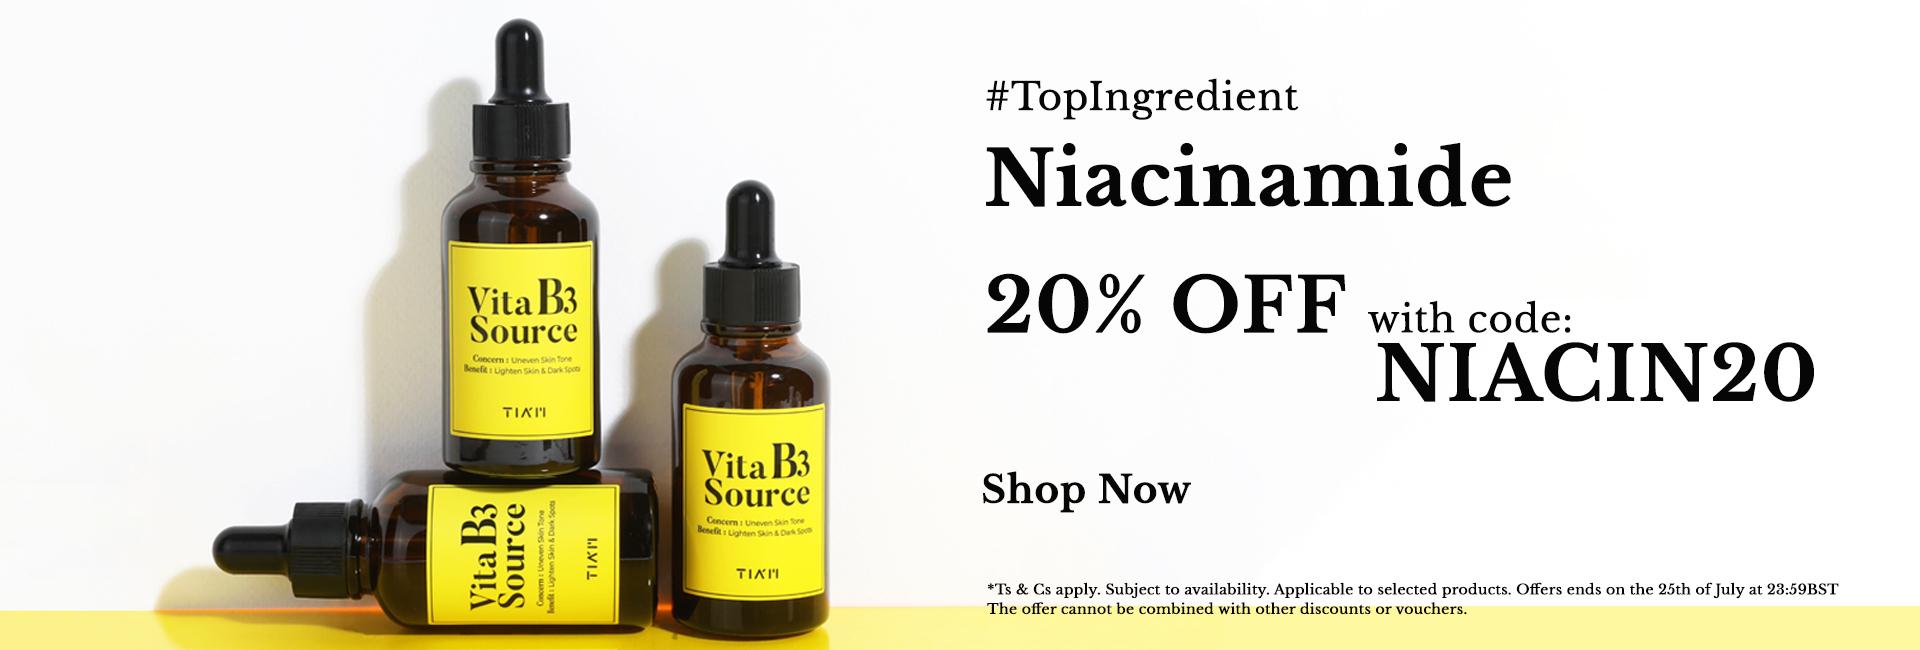 20% off on Niacinamide